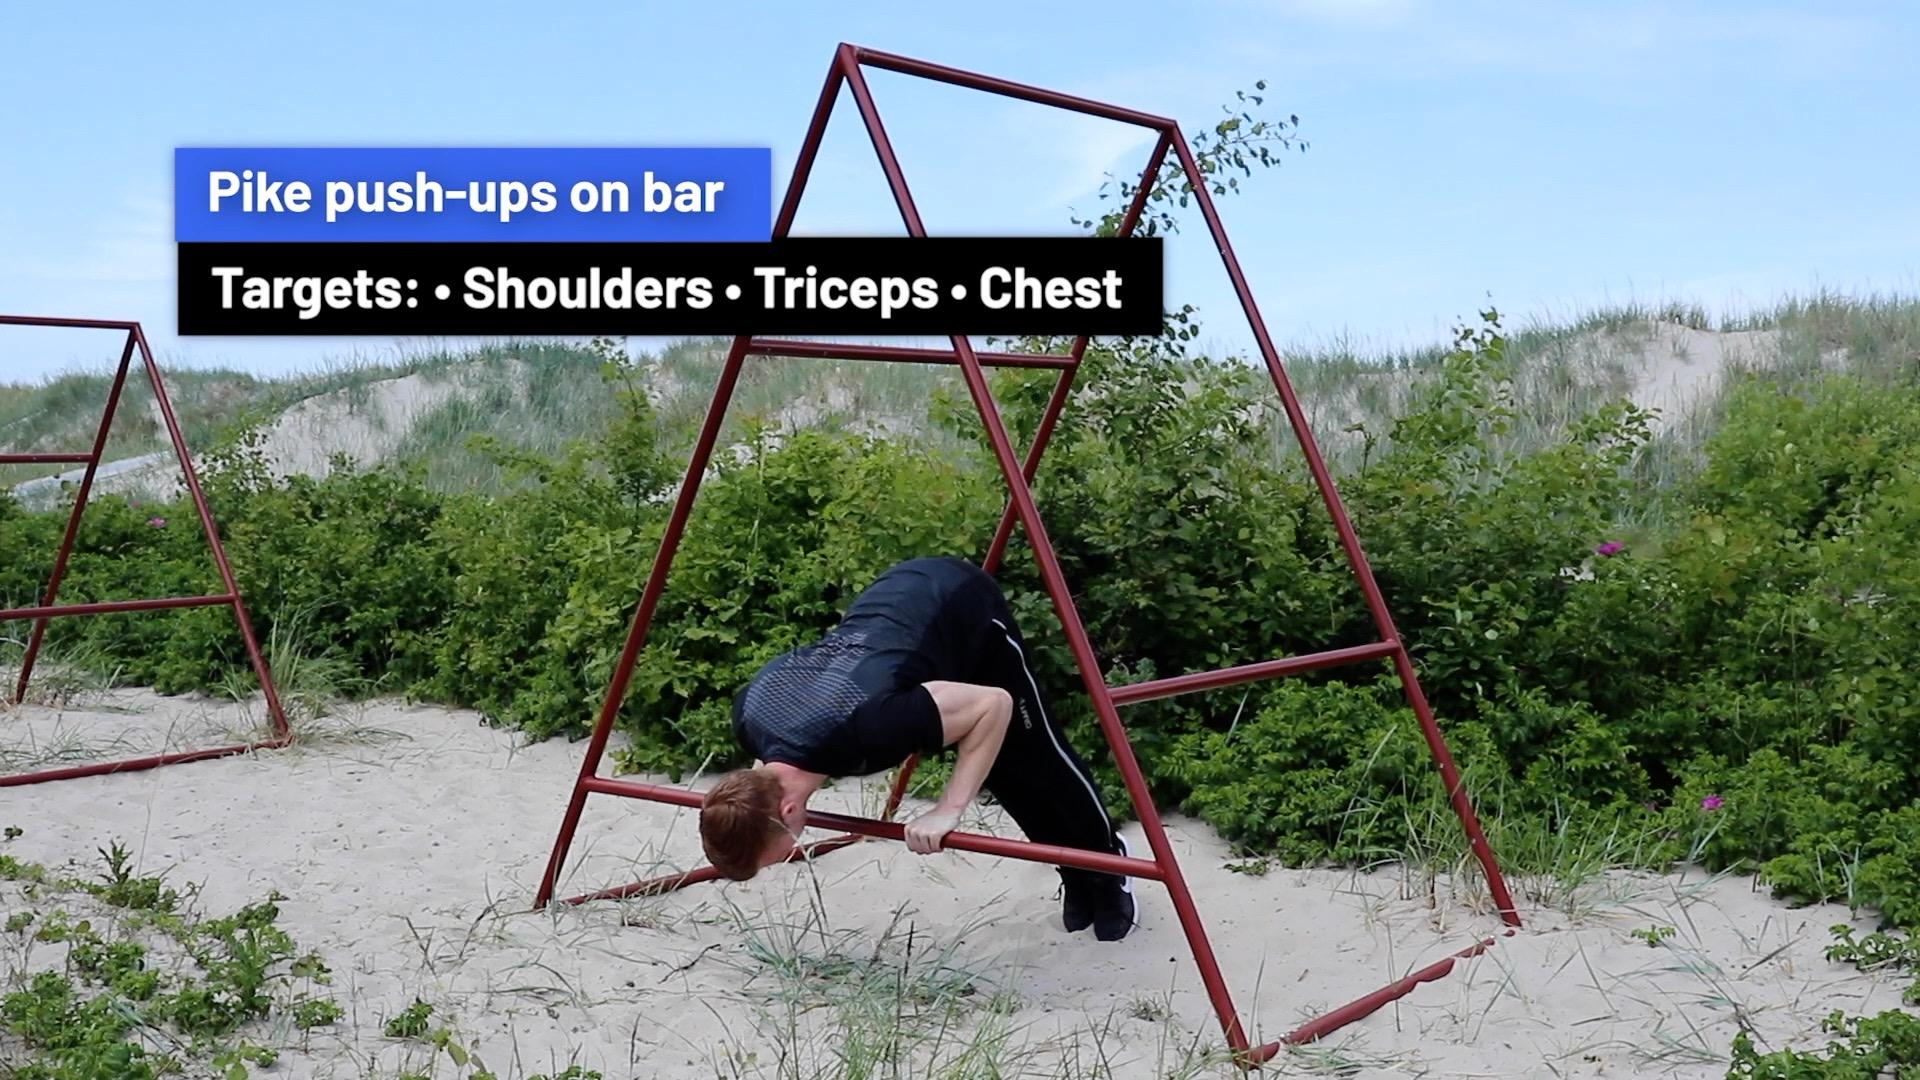 Pike push-ups on bar